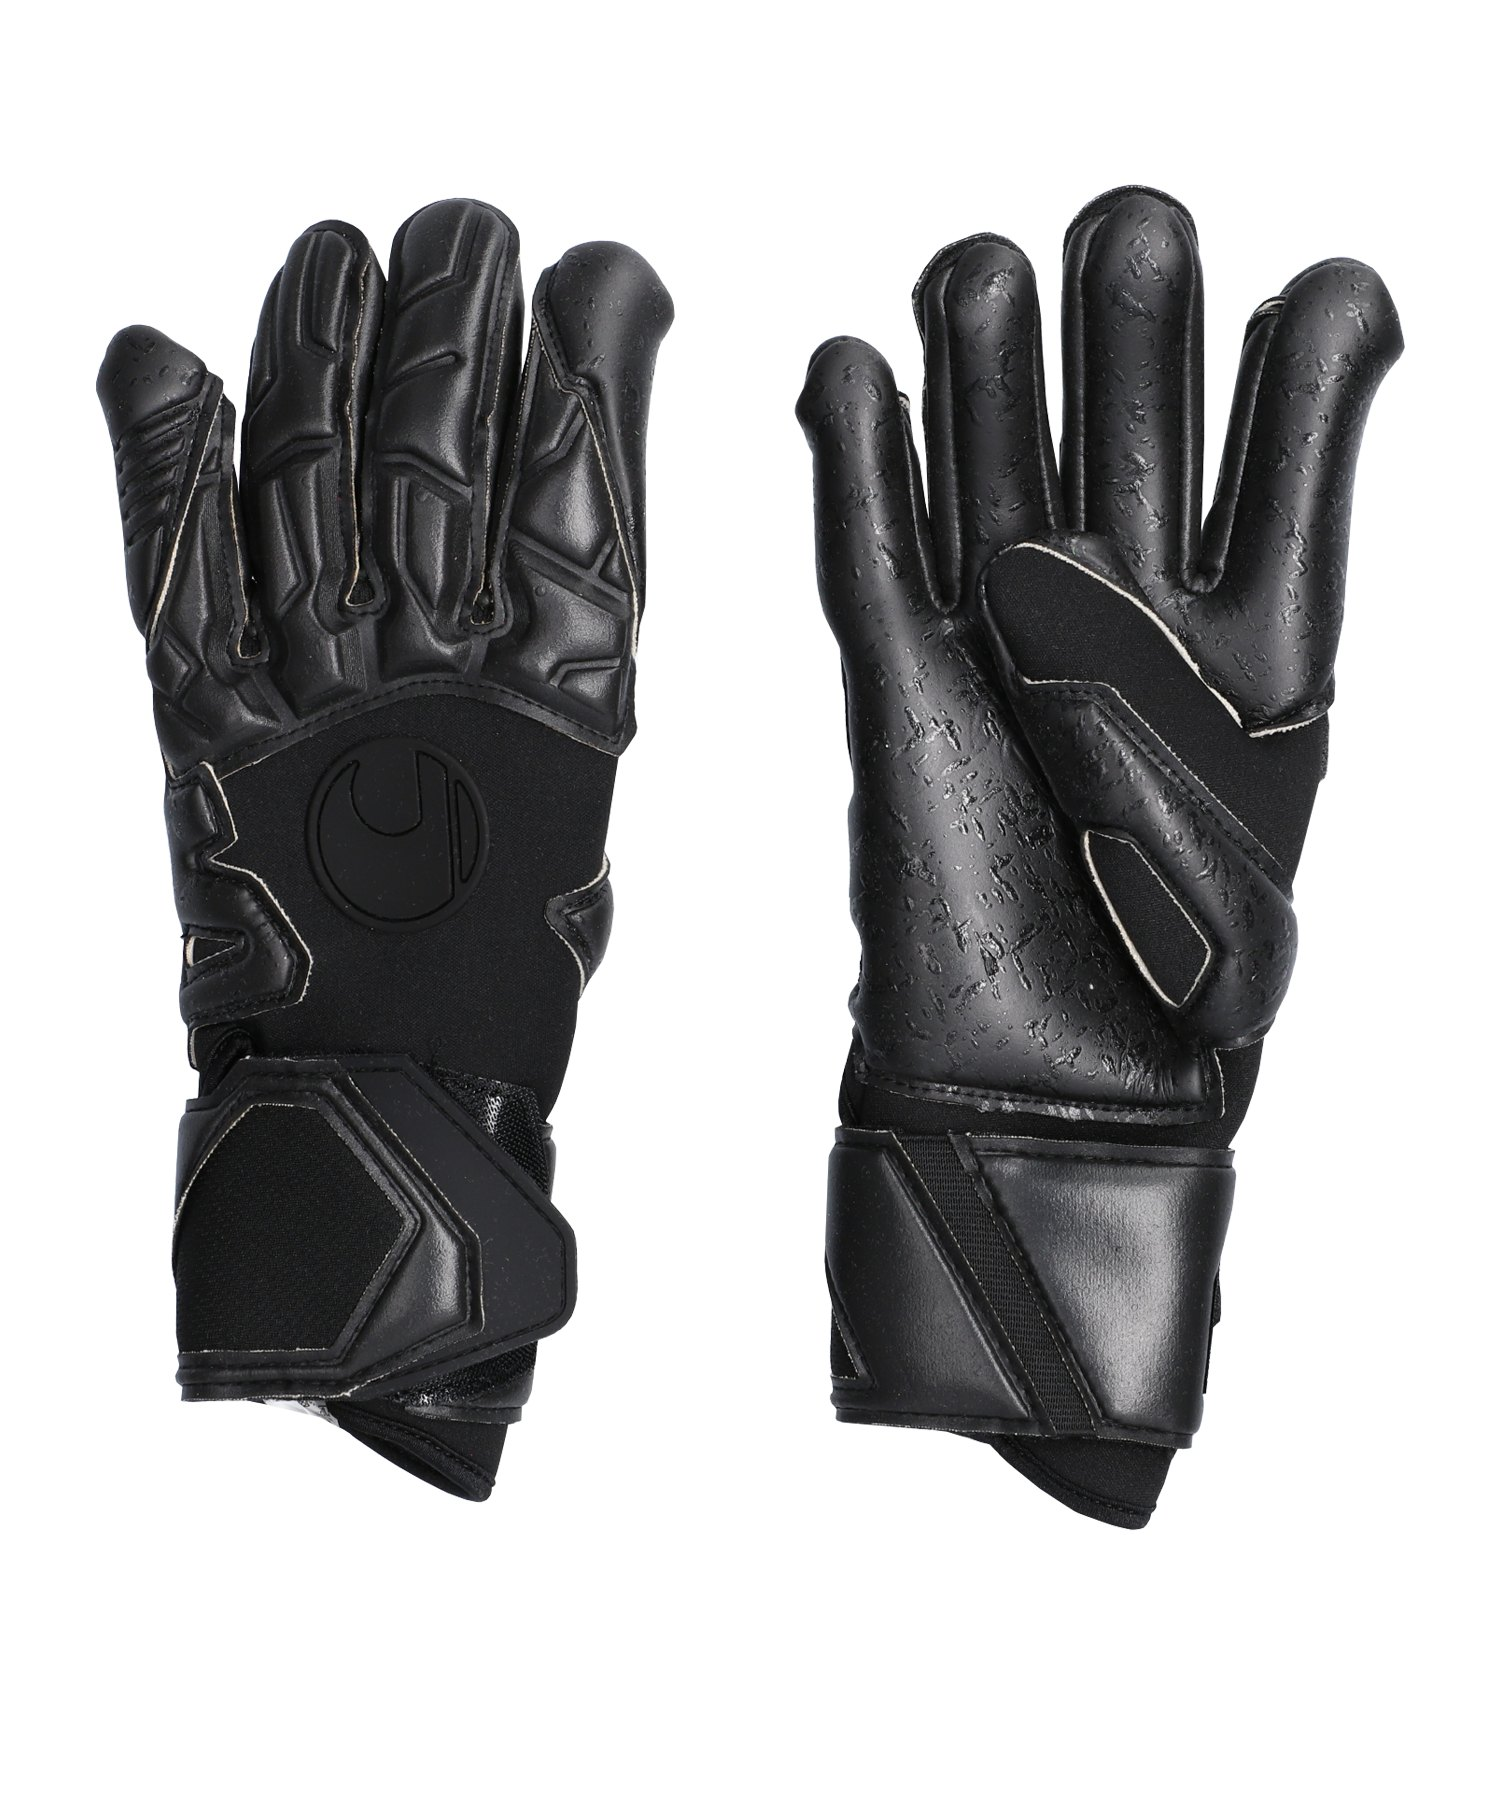 Uhlsport Black Edition Supergrip HN Handschuh F01 - schwarz